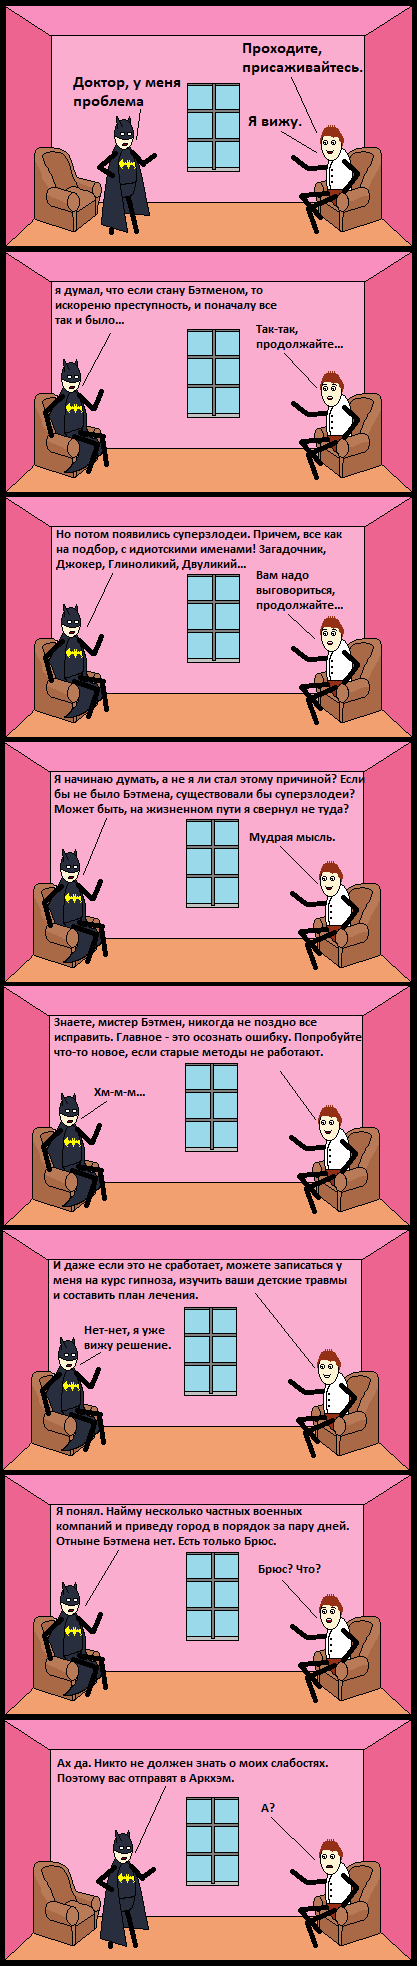 Бэтменское